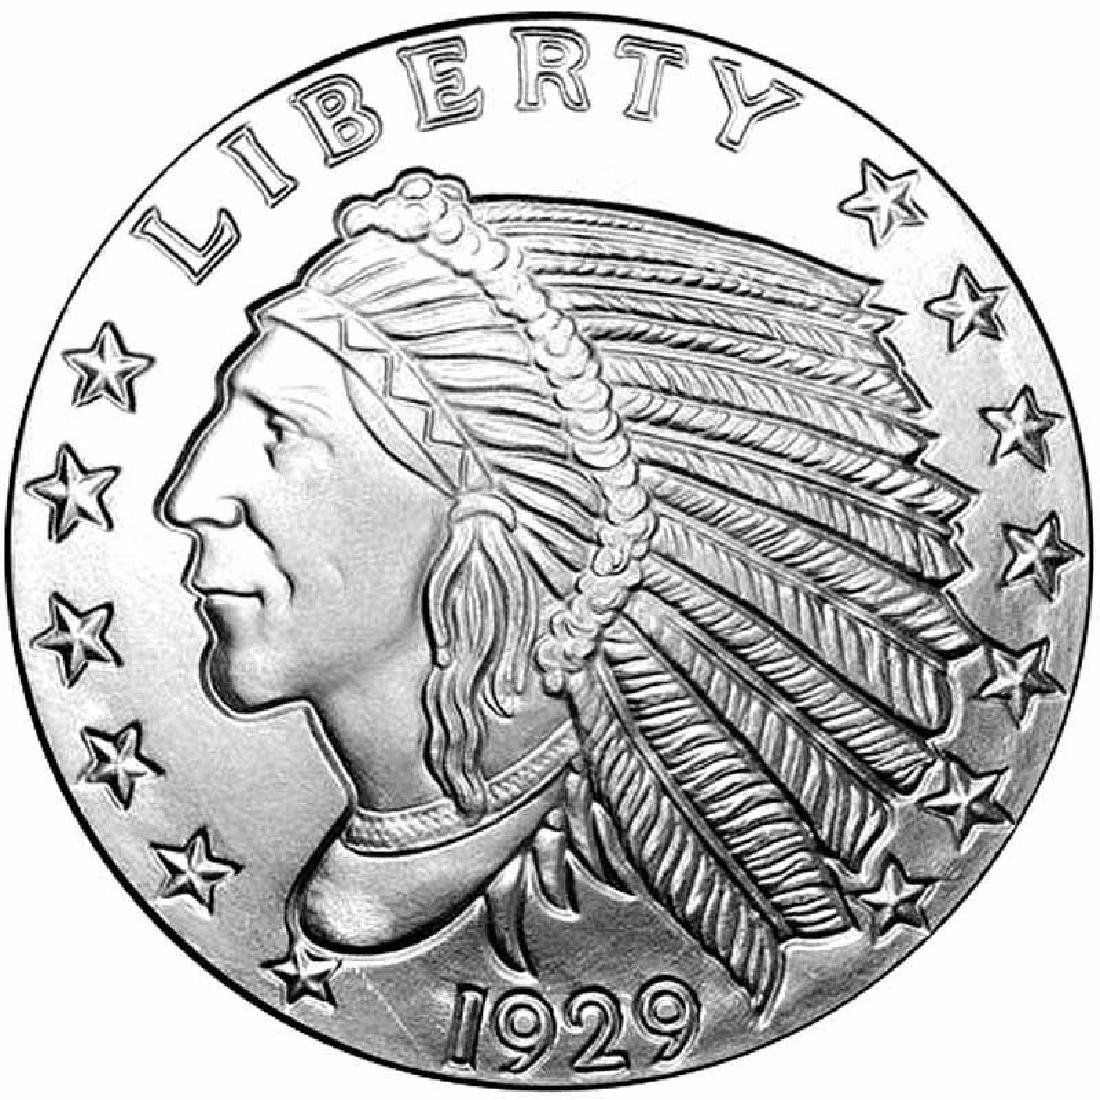 Silver Bullion 1/2 oz Incuse Indian Round .999 Fine